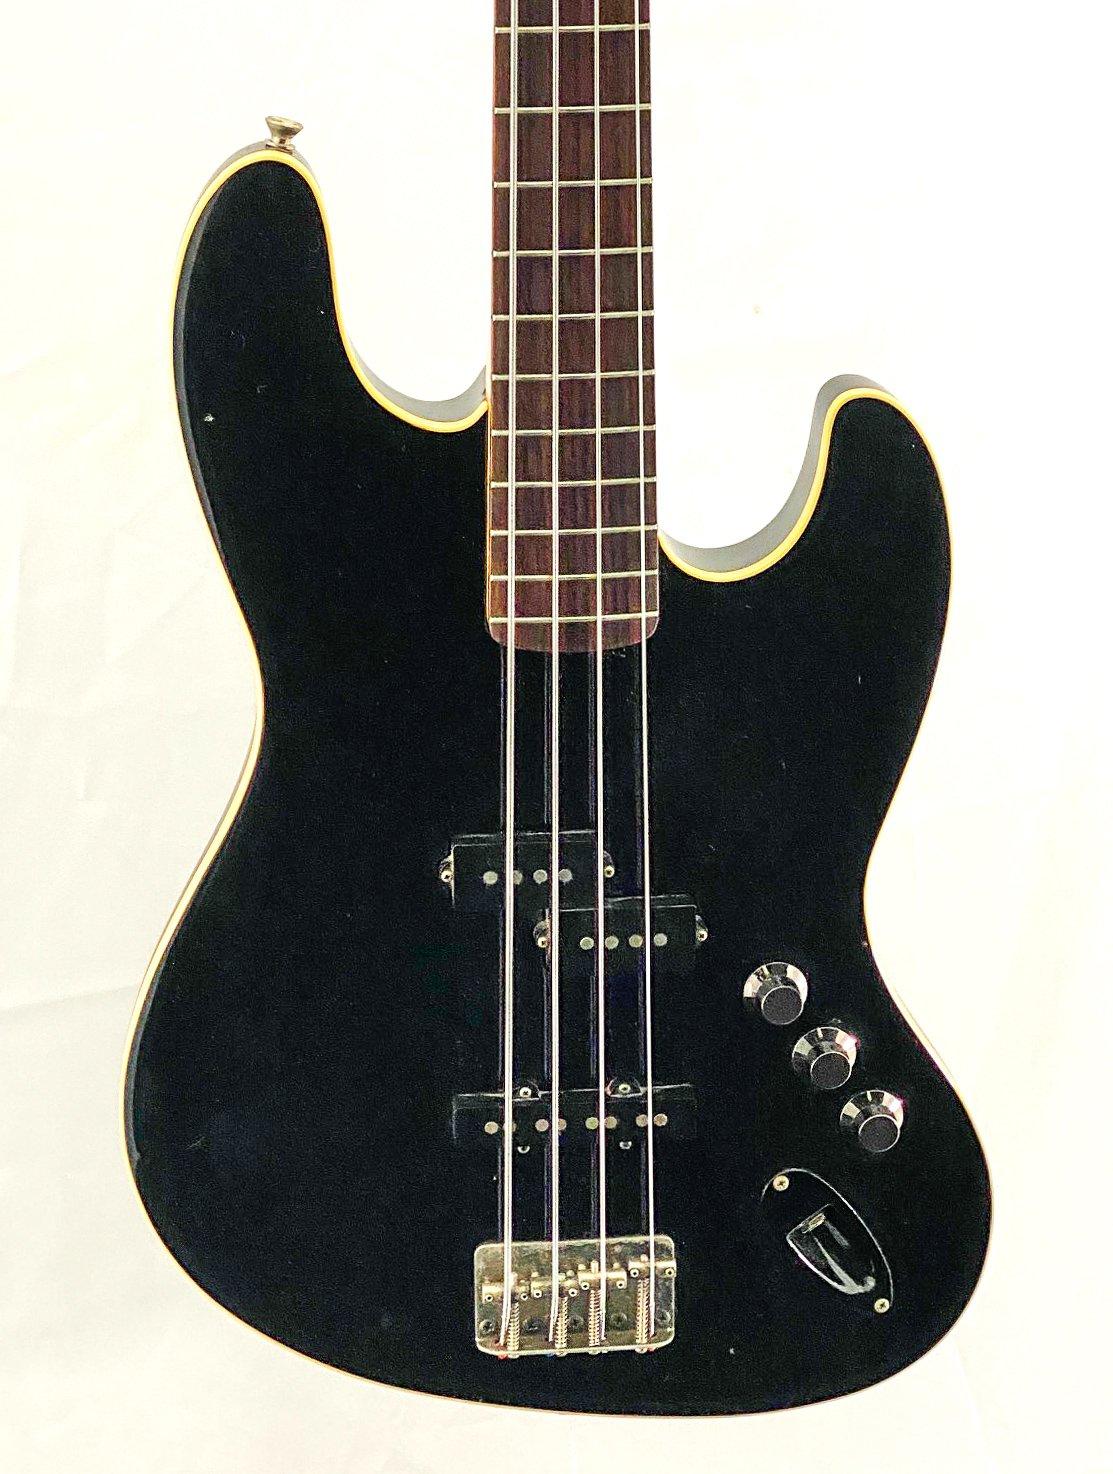 2002 Fender Aerodyne Jazz Bass - original run CIJ - w/case